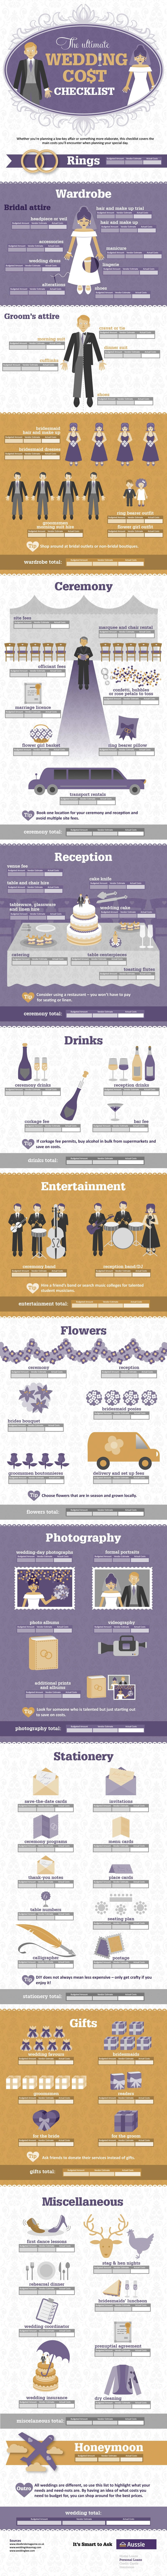 Planning Your Wedding?